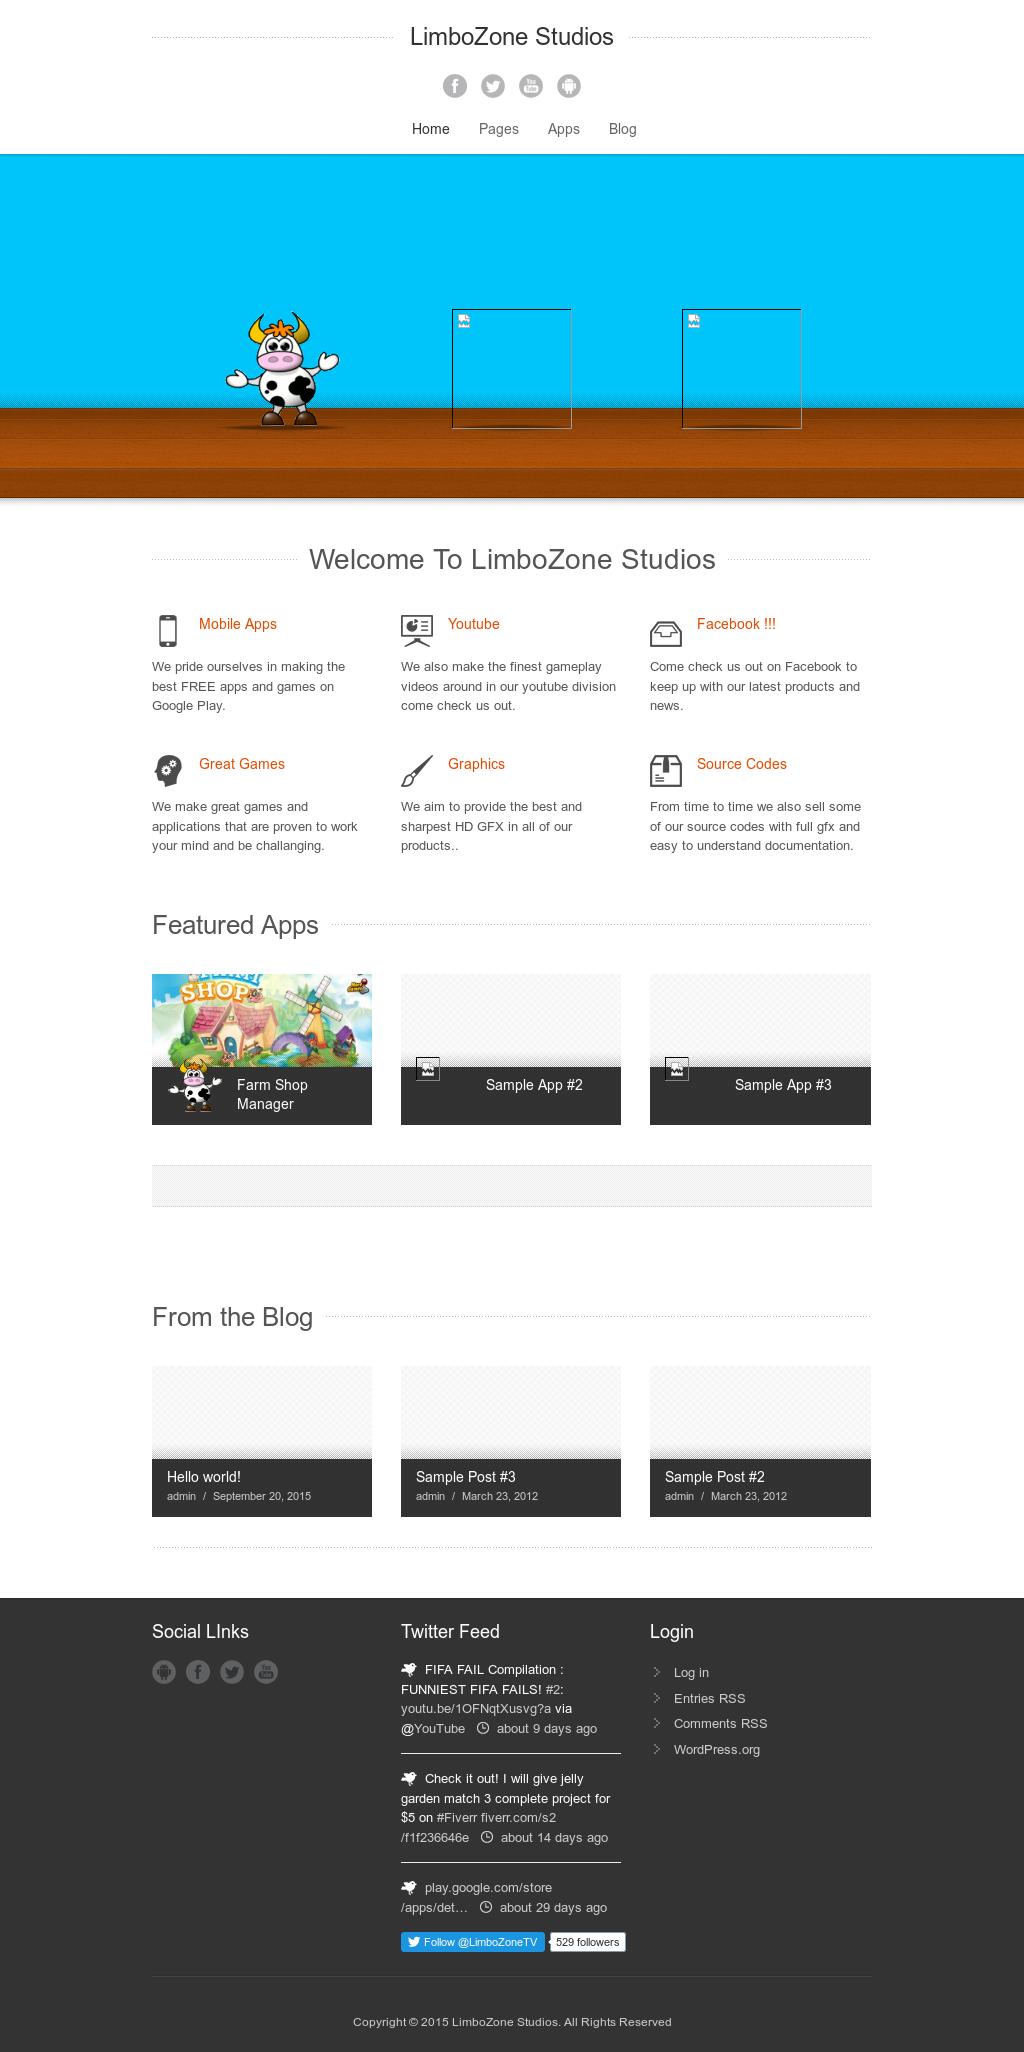 Limbozonetv Competitors, Revenue and Employees - Owler